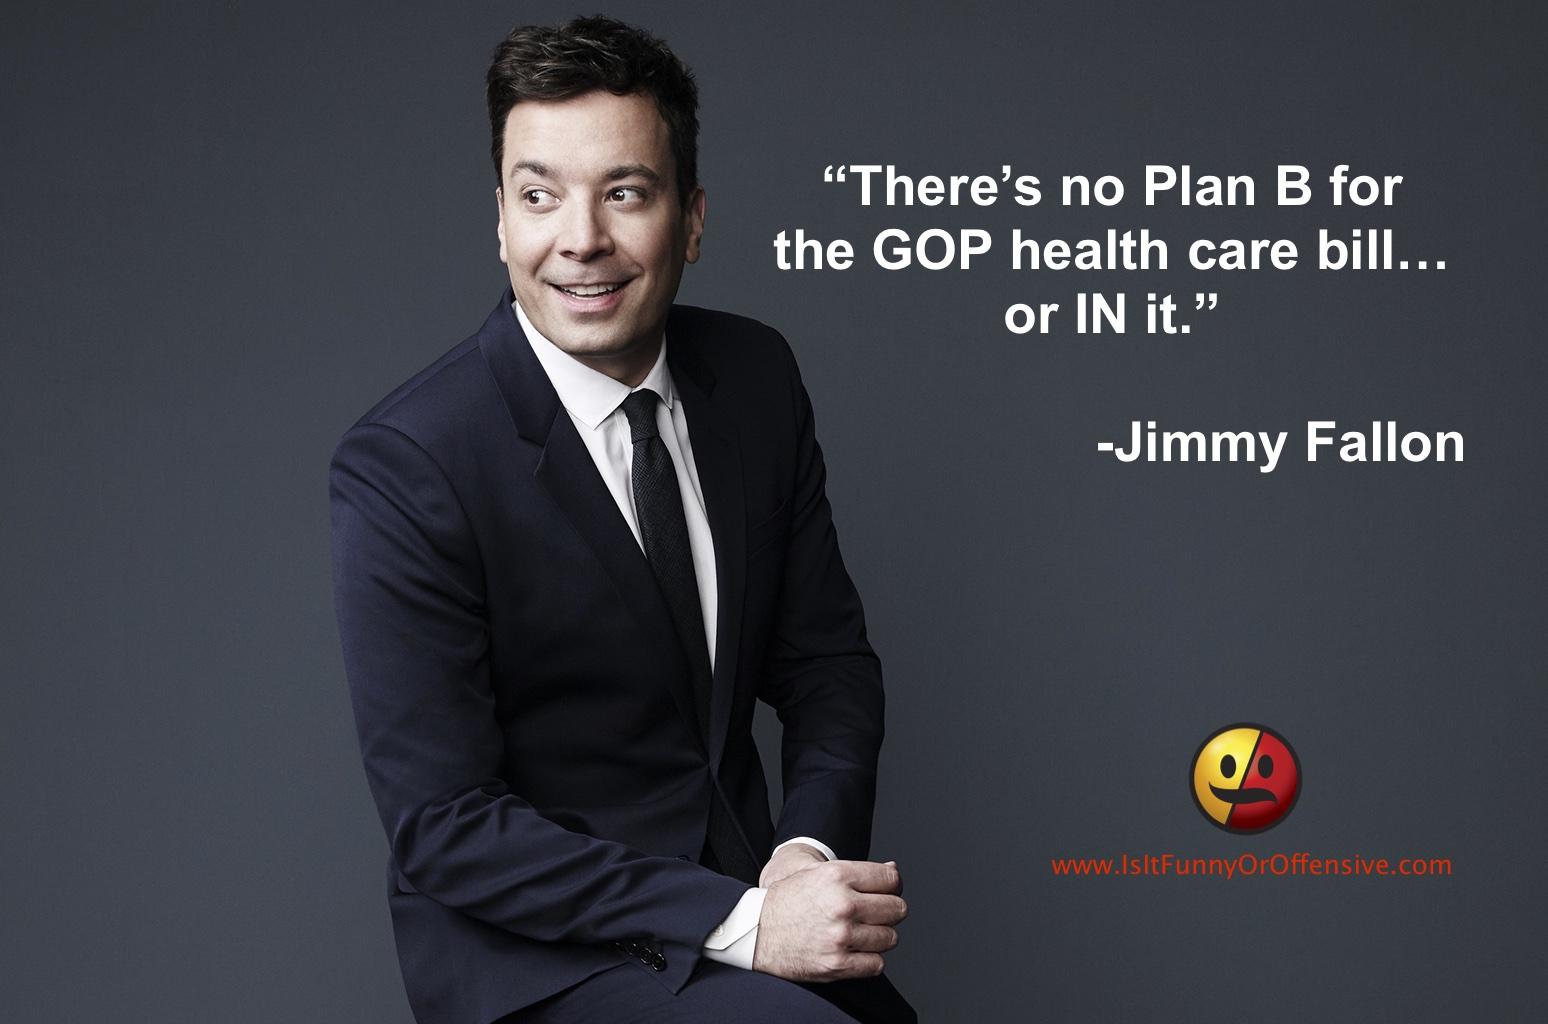 Jimmy Fallon on TrumpCare